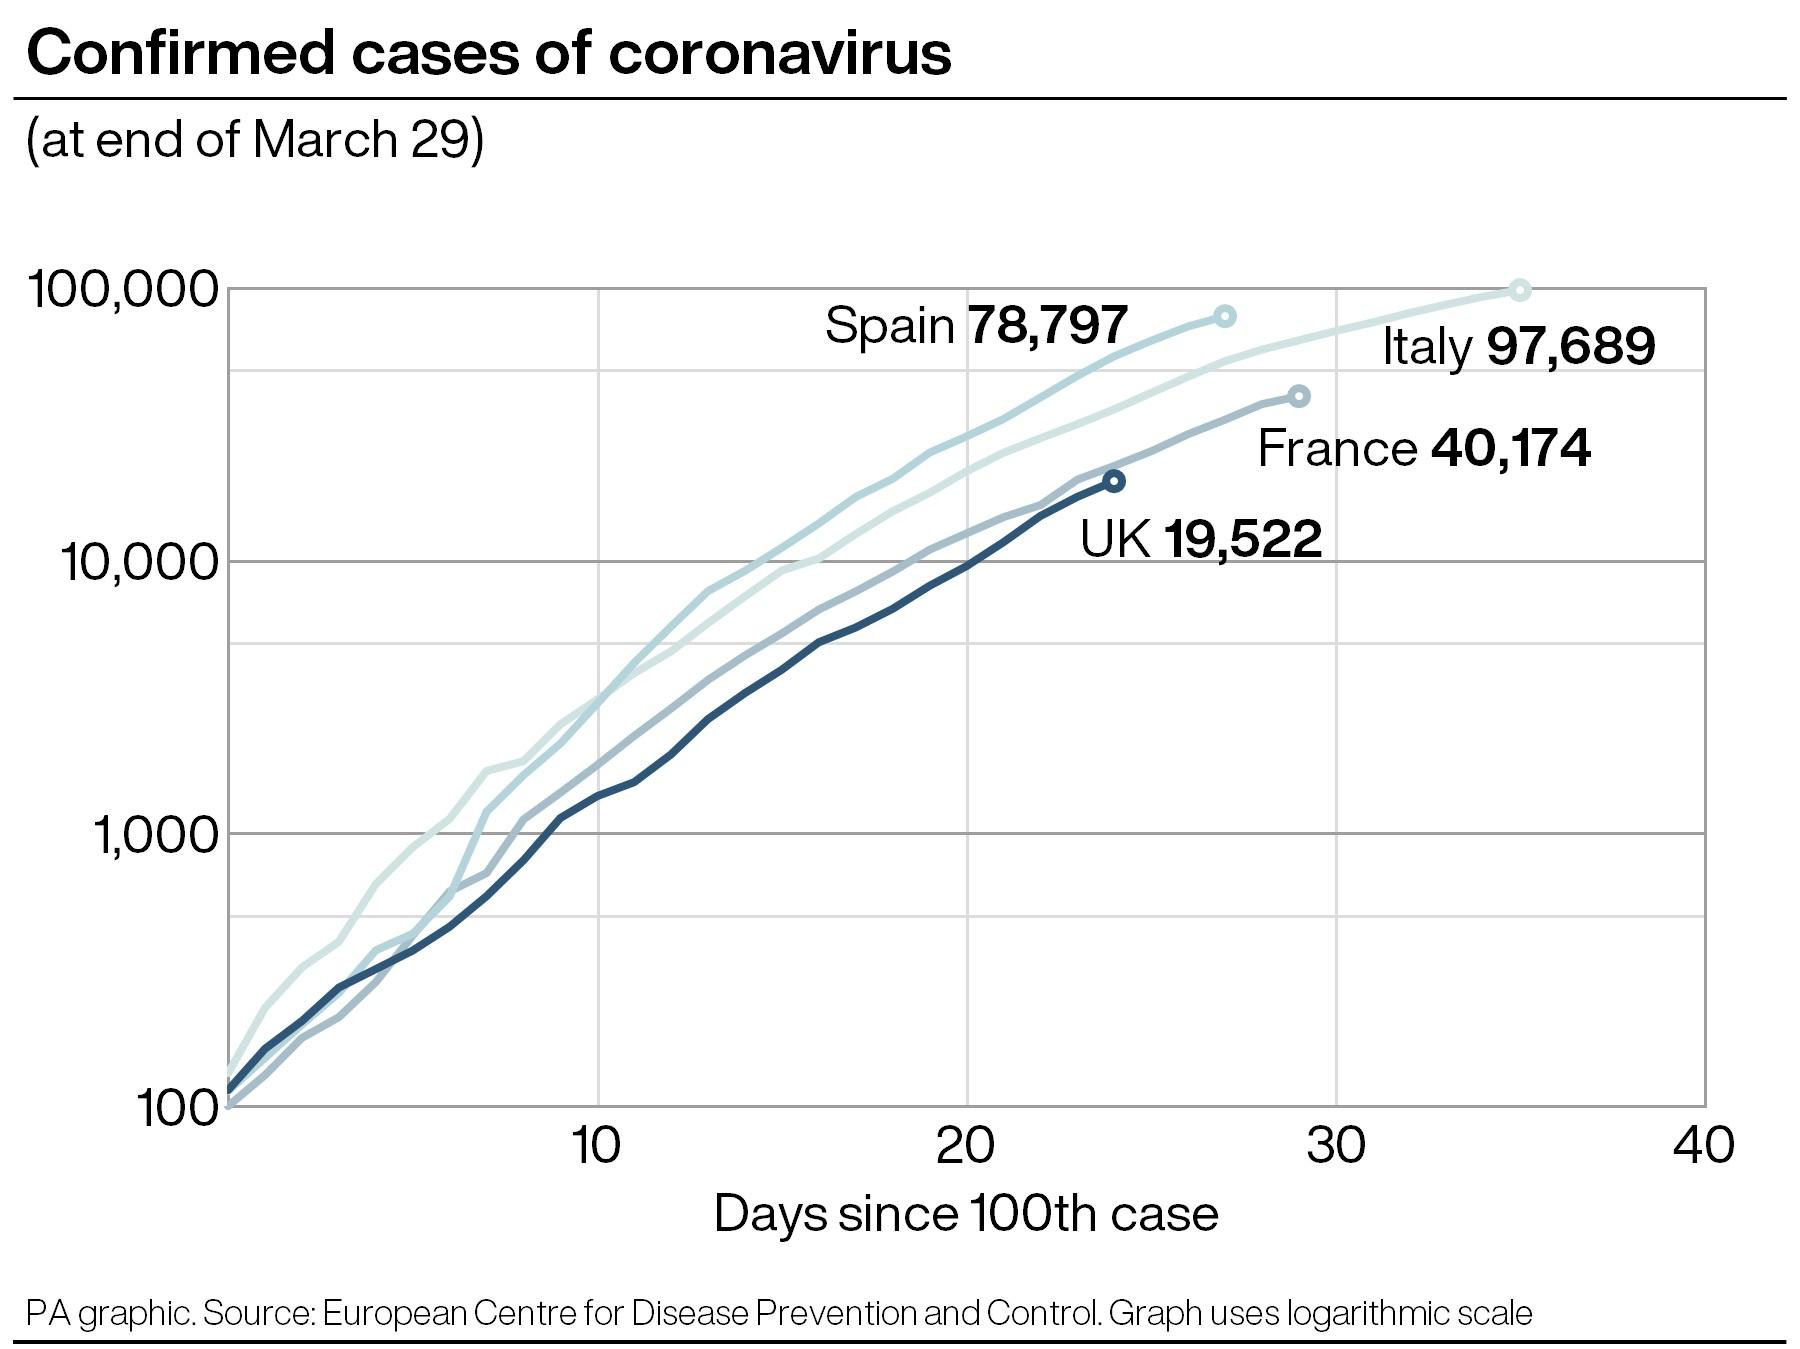 Birmingham's NEC to become temporary field hospital for coronavirus patients